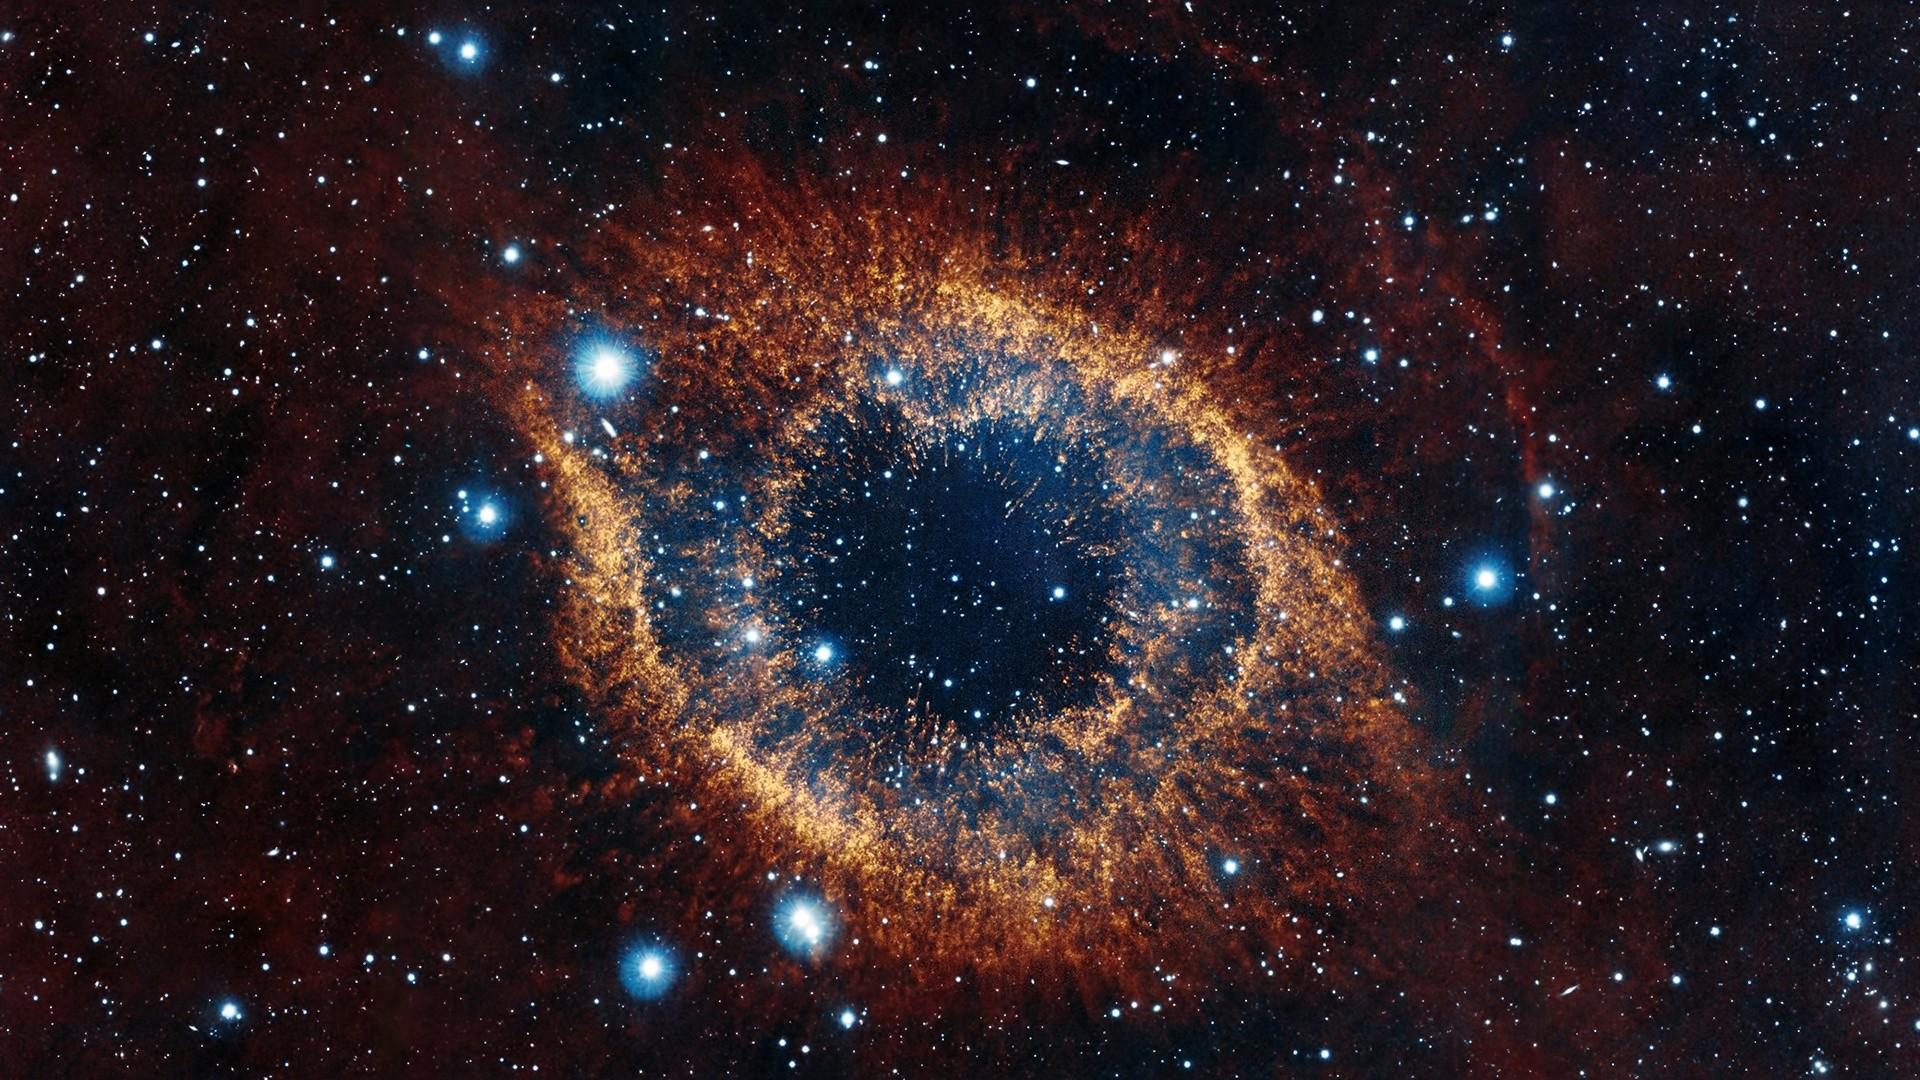 Eagle nebula wallpaper hd 63 images - Pillars of creation wallpaper ...